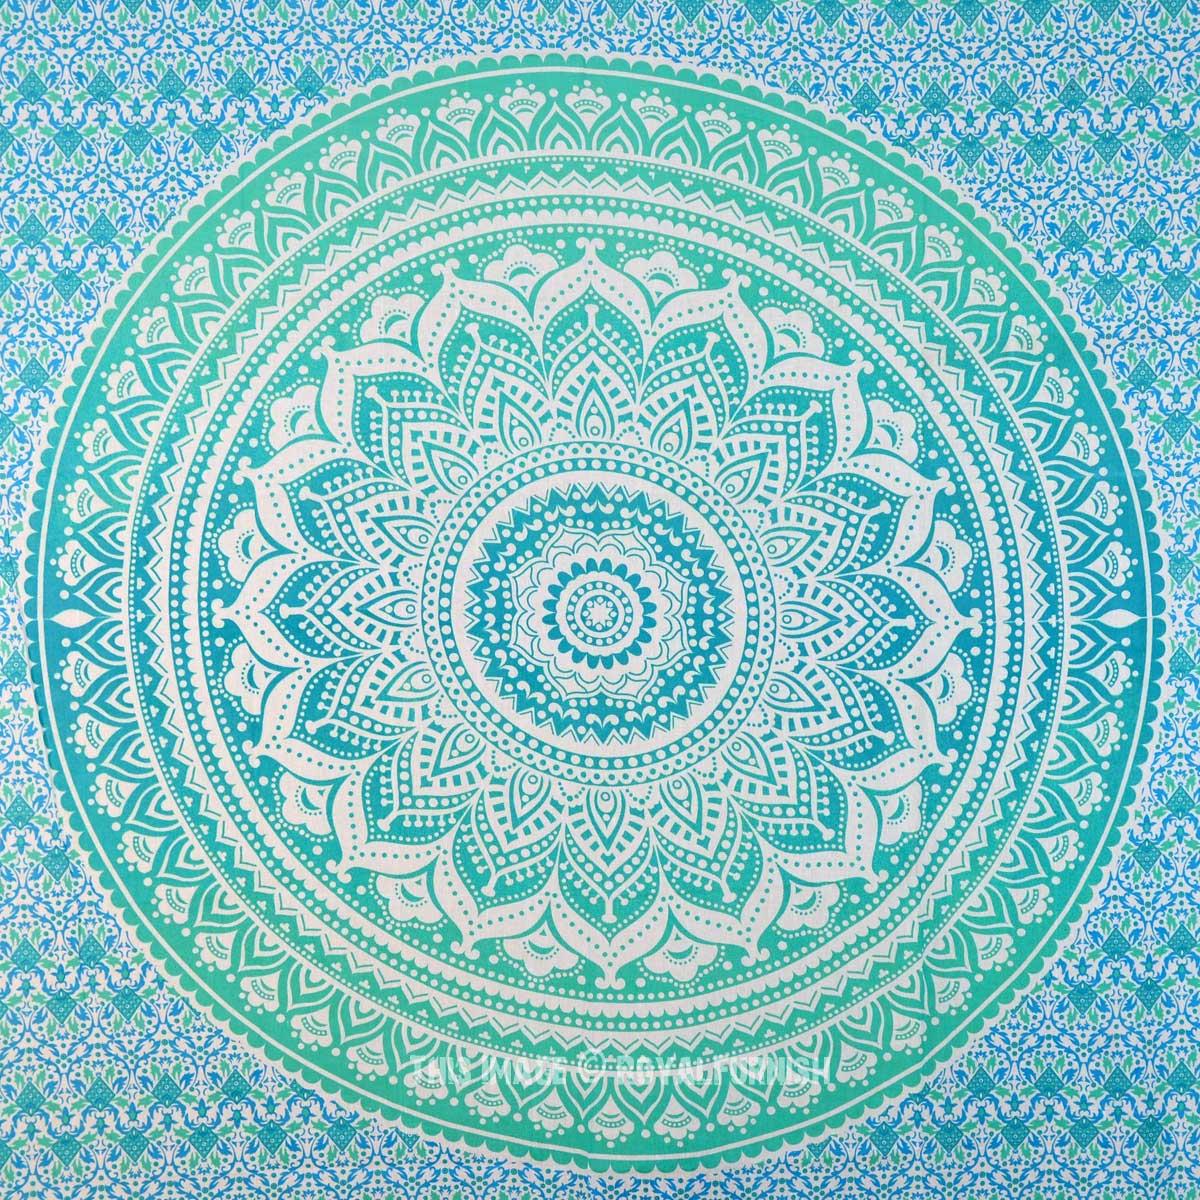 Small Green Floral Circle Ombre Wall Tapestry Mandala